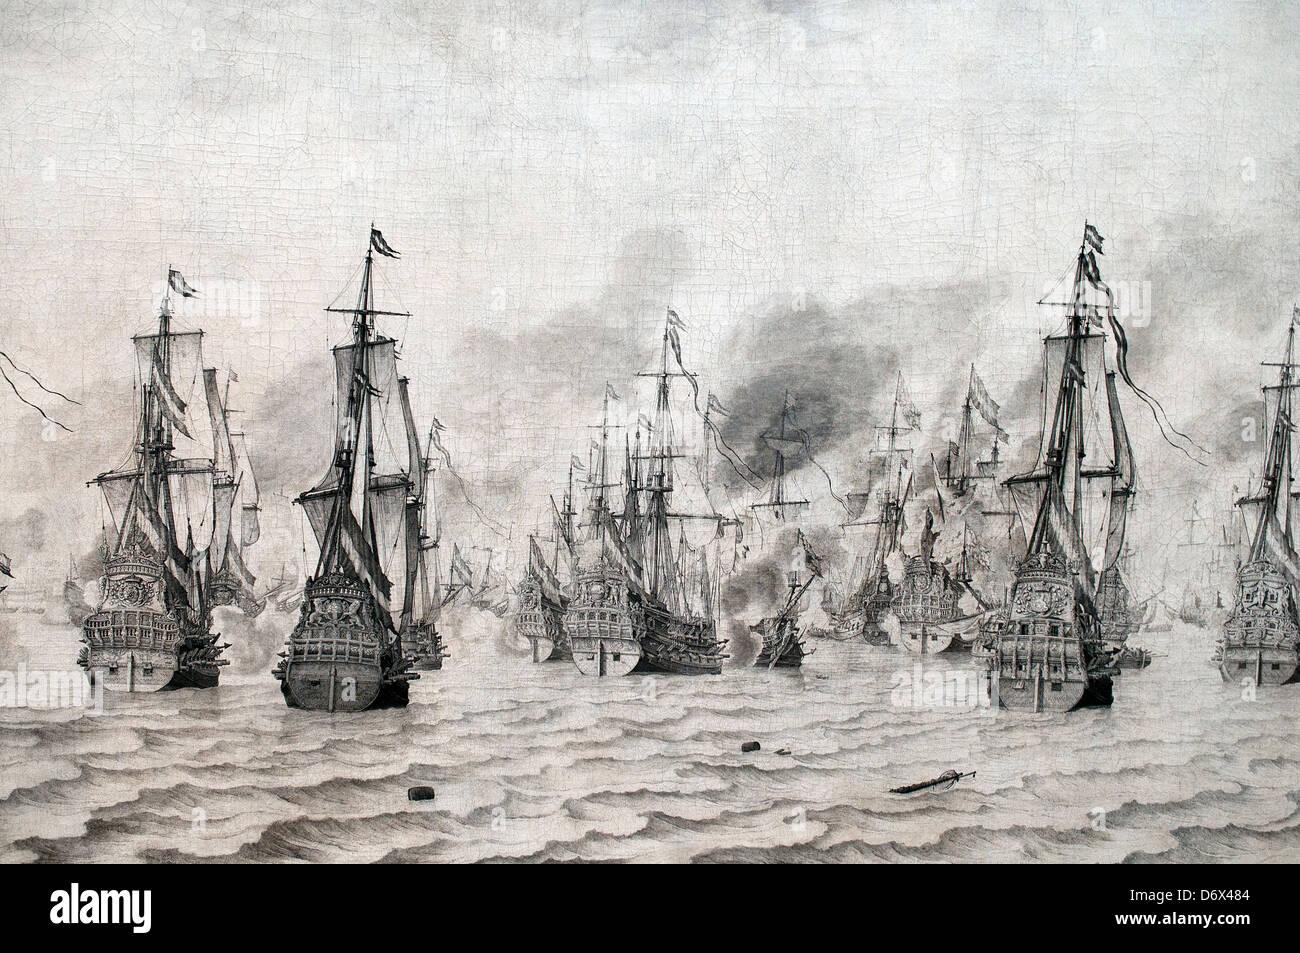 The Battle of Livorno ( Leghorn ) 1659 Willem van de Velde  1611-1693 Dutch Netherlands - Stock Image